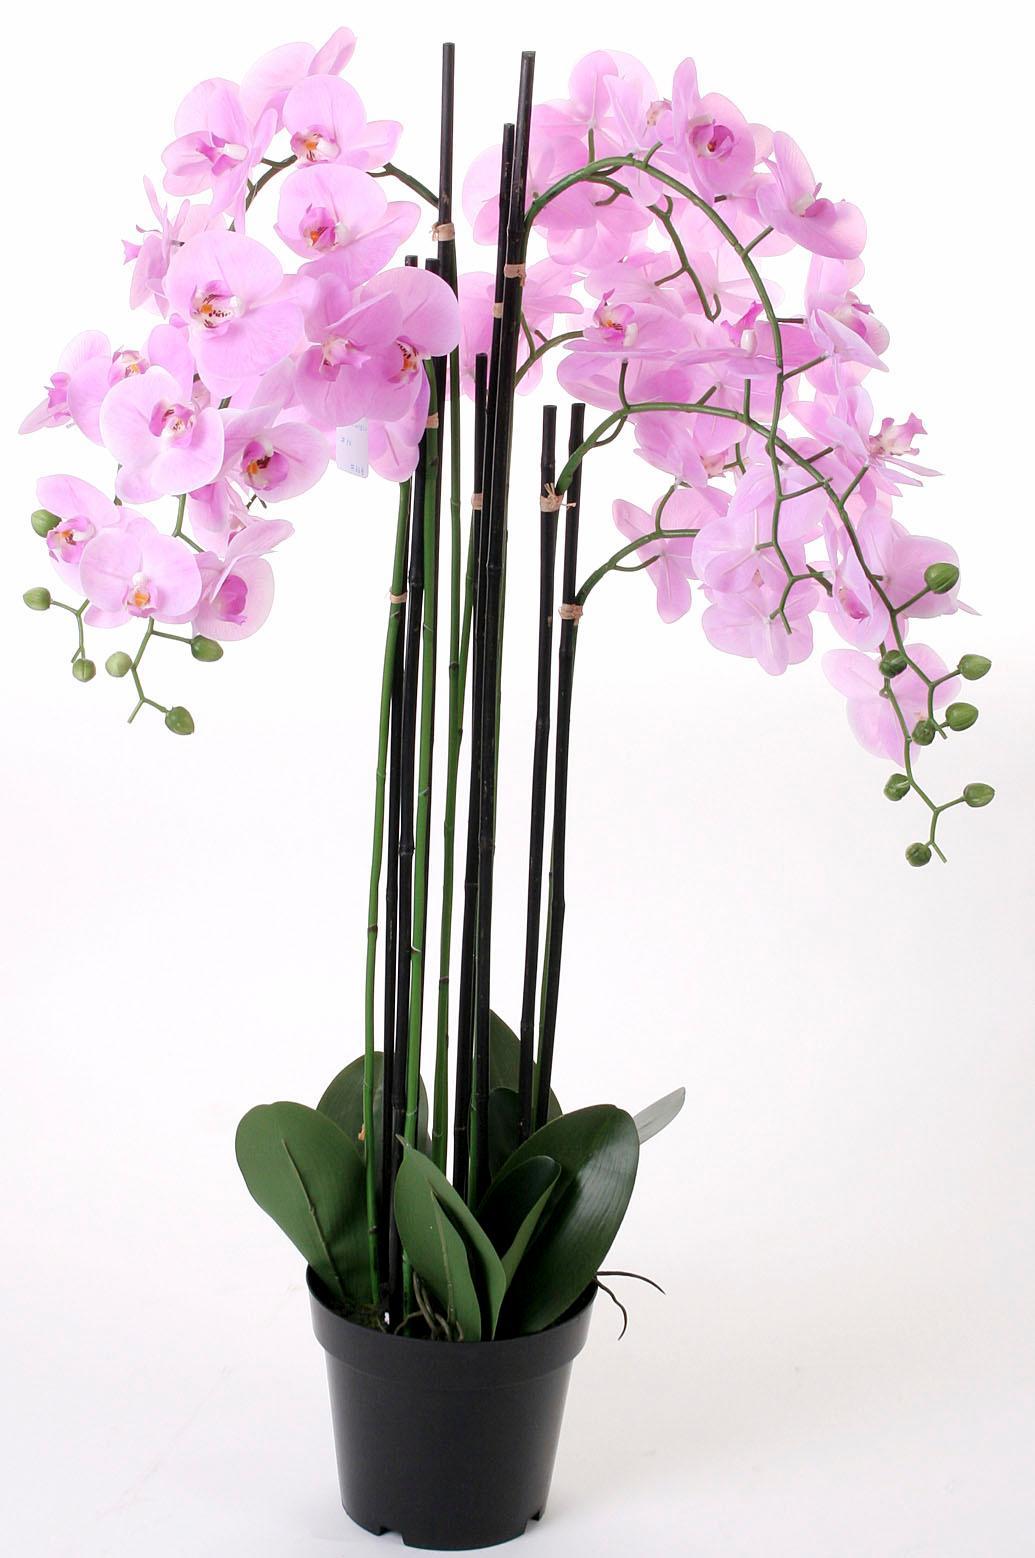 Kunstorchidee Orchidee XXL Technik & Freizeit/Heimwerken & Garten/Garten & Balkon/Pflanzen/Kunstpflanzen/Kunst-Orchideen